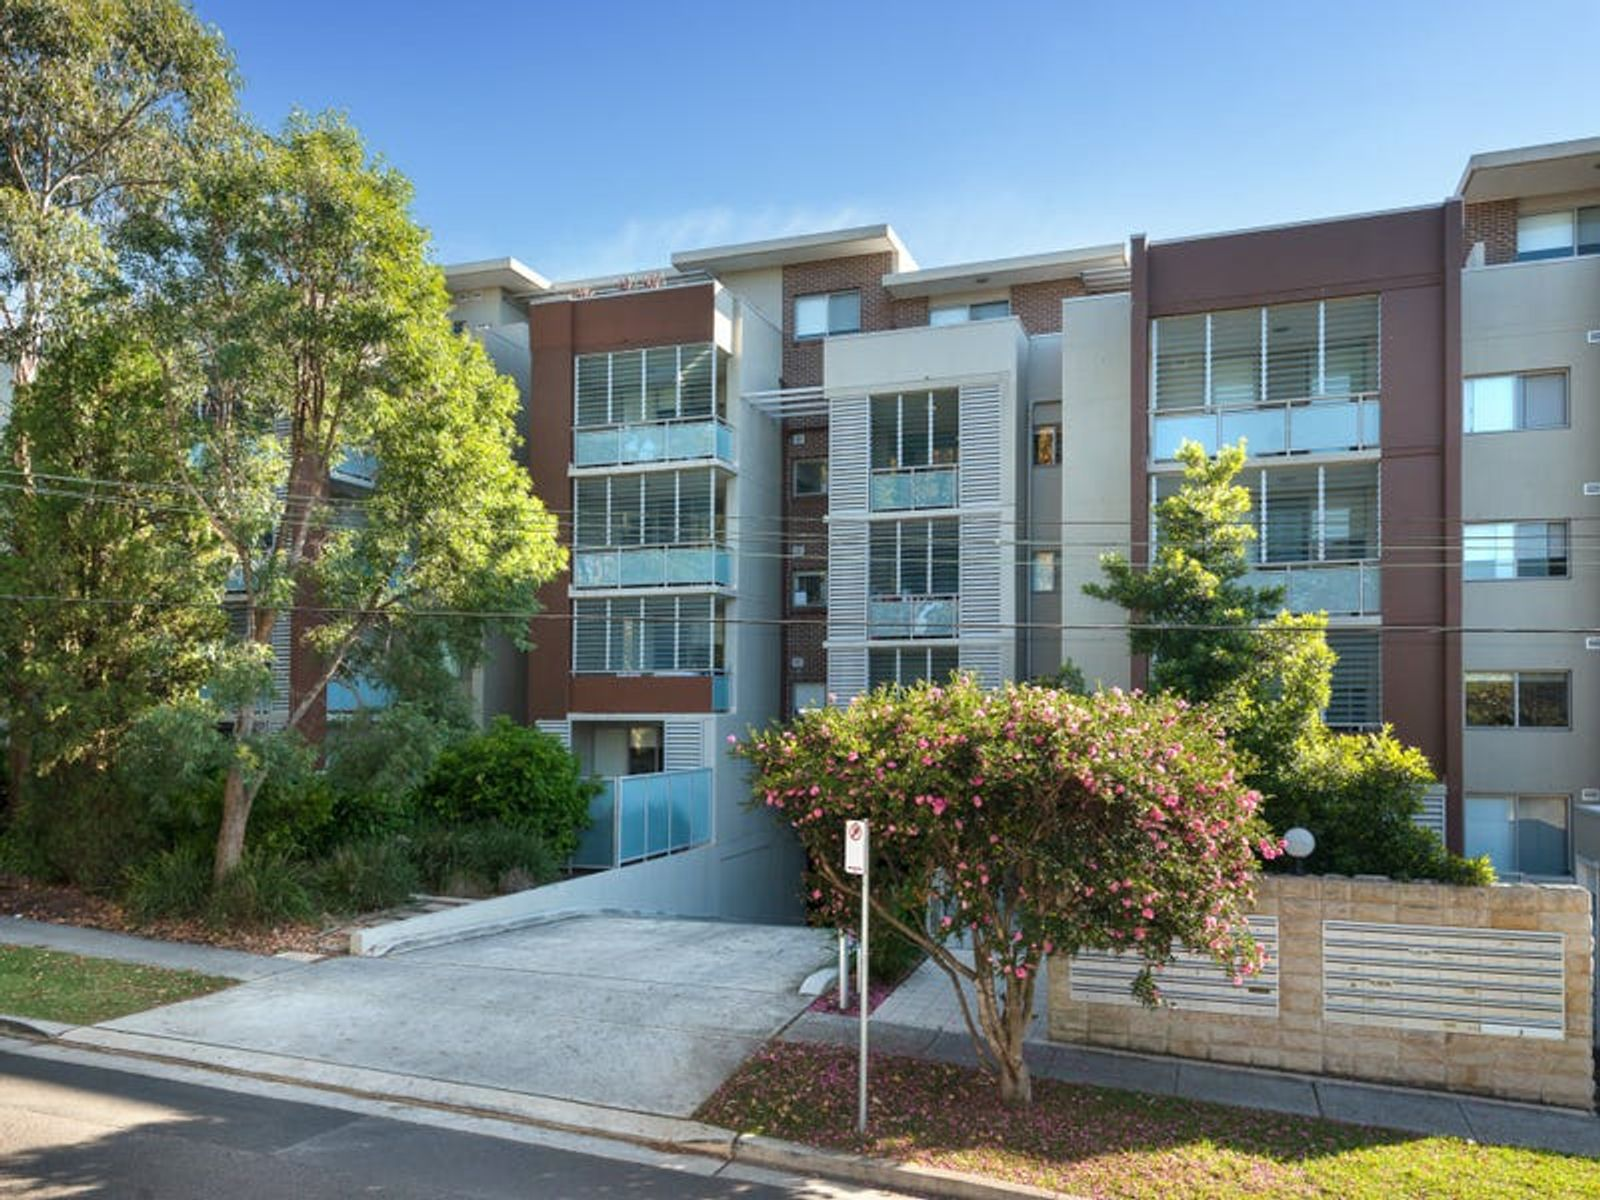 10/1-3 Cherry Street, Warrawee, NSW 2074